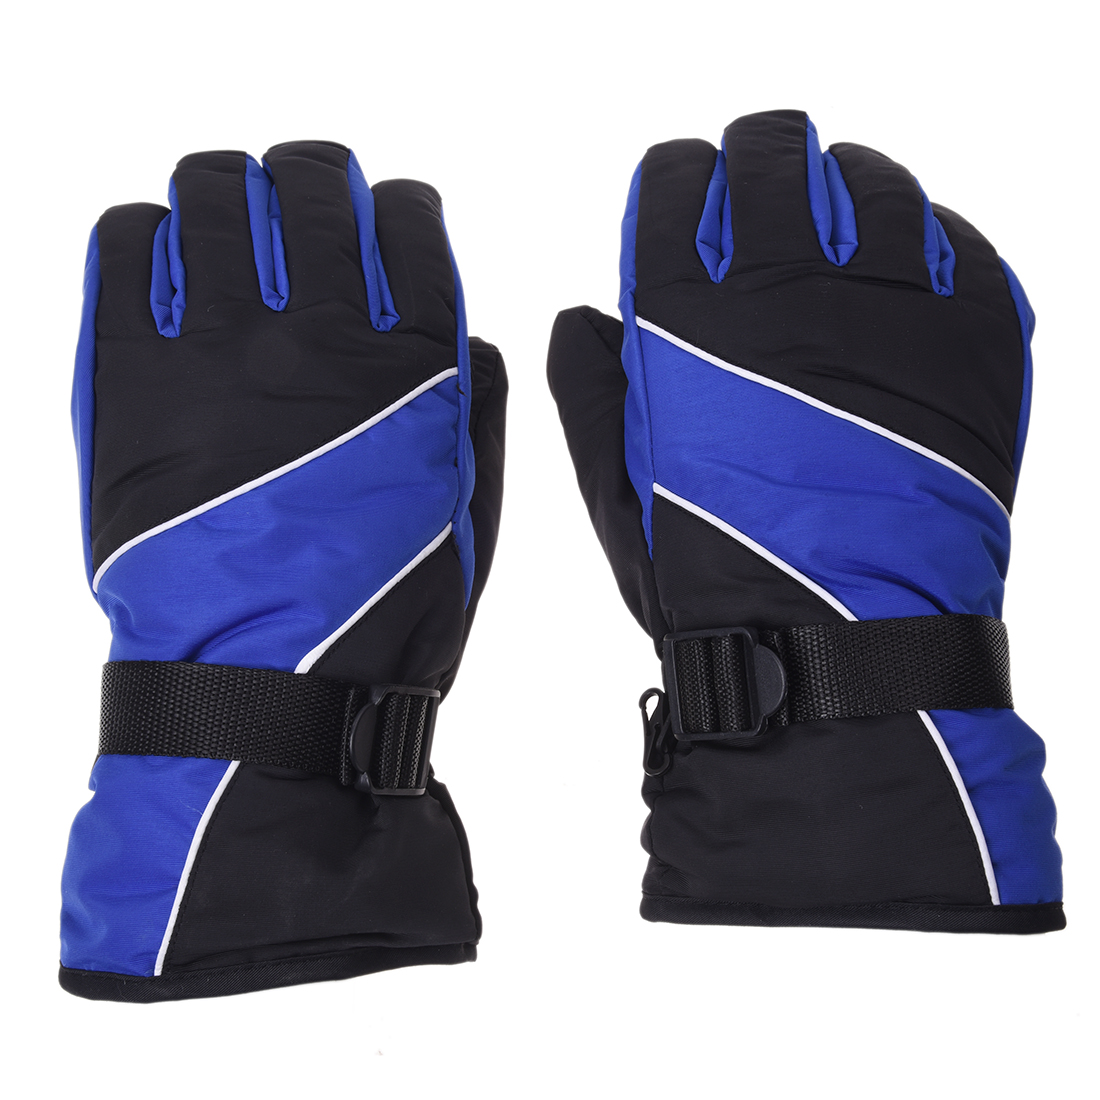 Mens ski gloves xxl - Men Ski Gloves Thermal Waterproof For Winter Outdoor Sports Snowboard Blue China